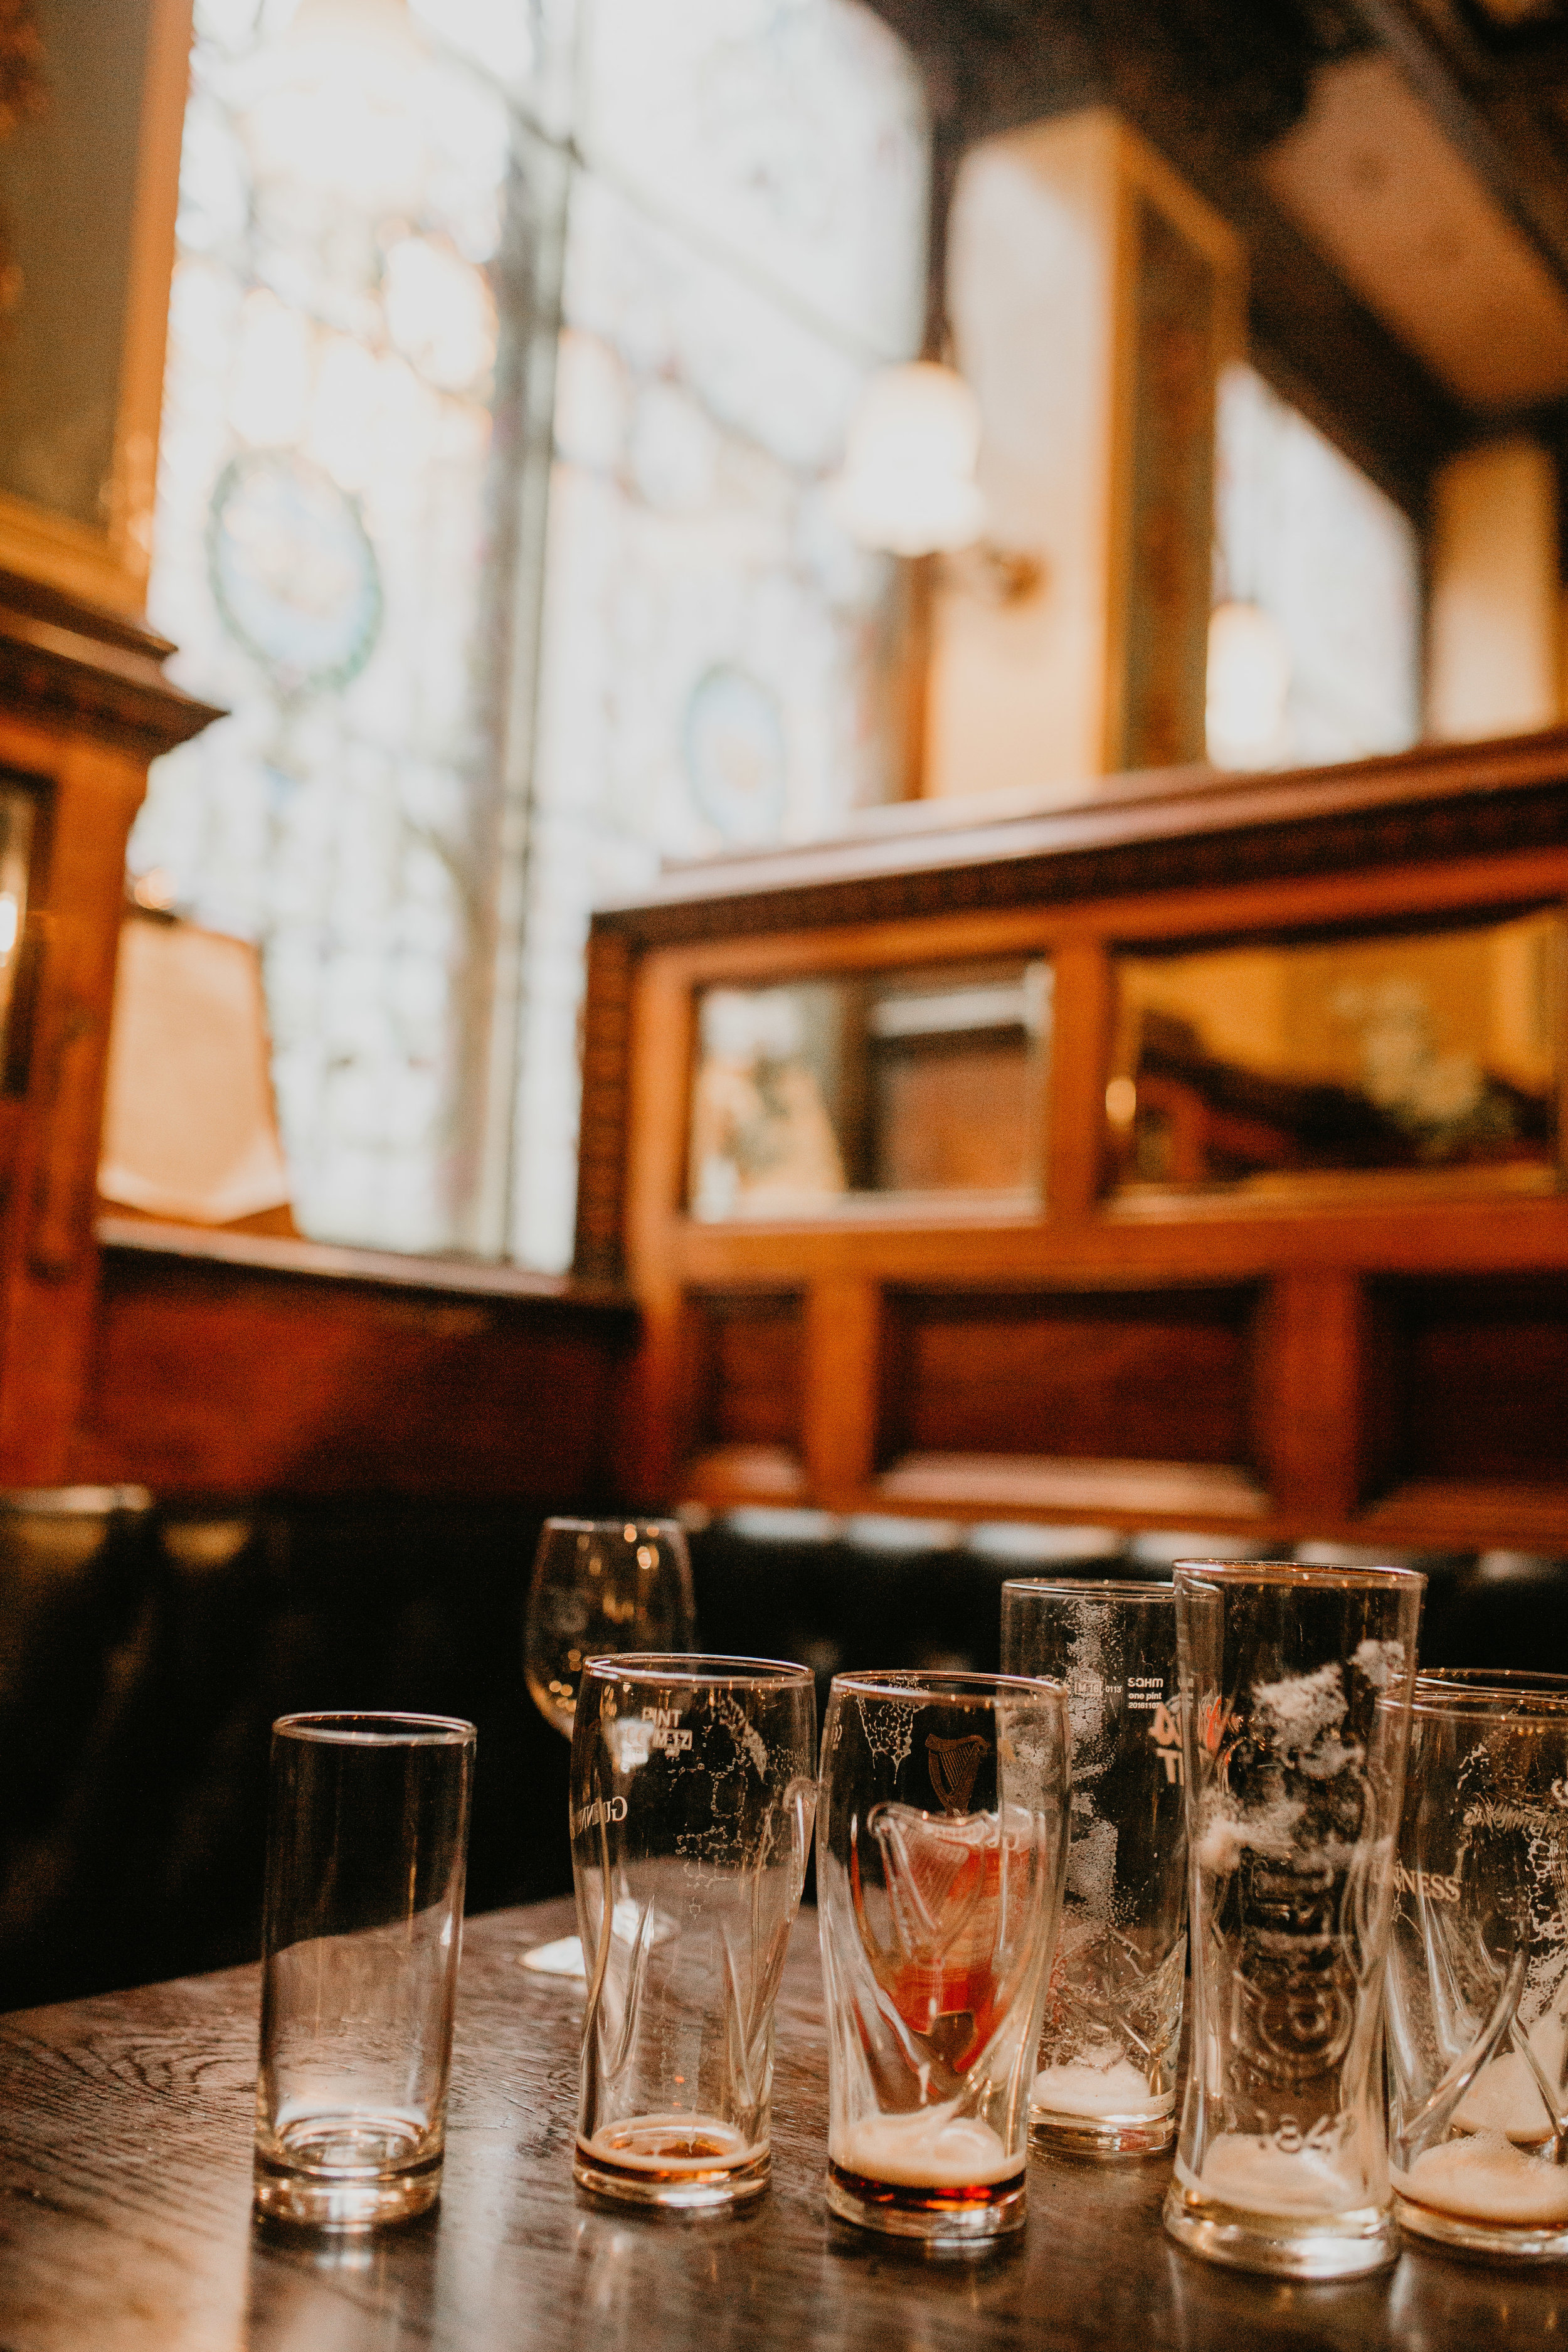 nicole-daacke-photography-ireland-destination-elopement-wedding-photographer-destination-wedding-irish-castle-wedding-intimate-ireland-wedding-photographer-ireland-elopement-photographer-dublin-howth-belfast-antrim-destination-wedding-photos-22.jpg